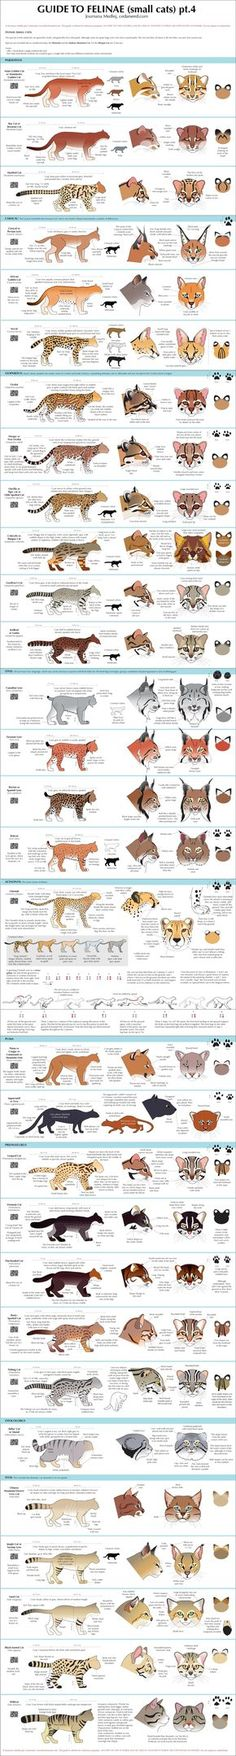 Guide to felinae (small cats), pt. 4 by Majnouna | #cat #gato #crazycatlady #ilustração #illustration #felinos #bigcats #mothernature #mãenatureza